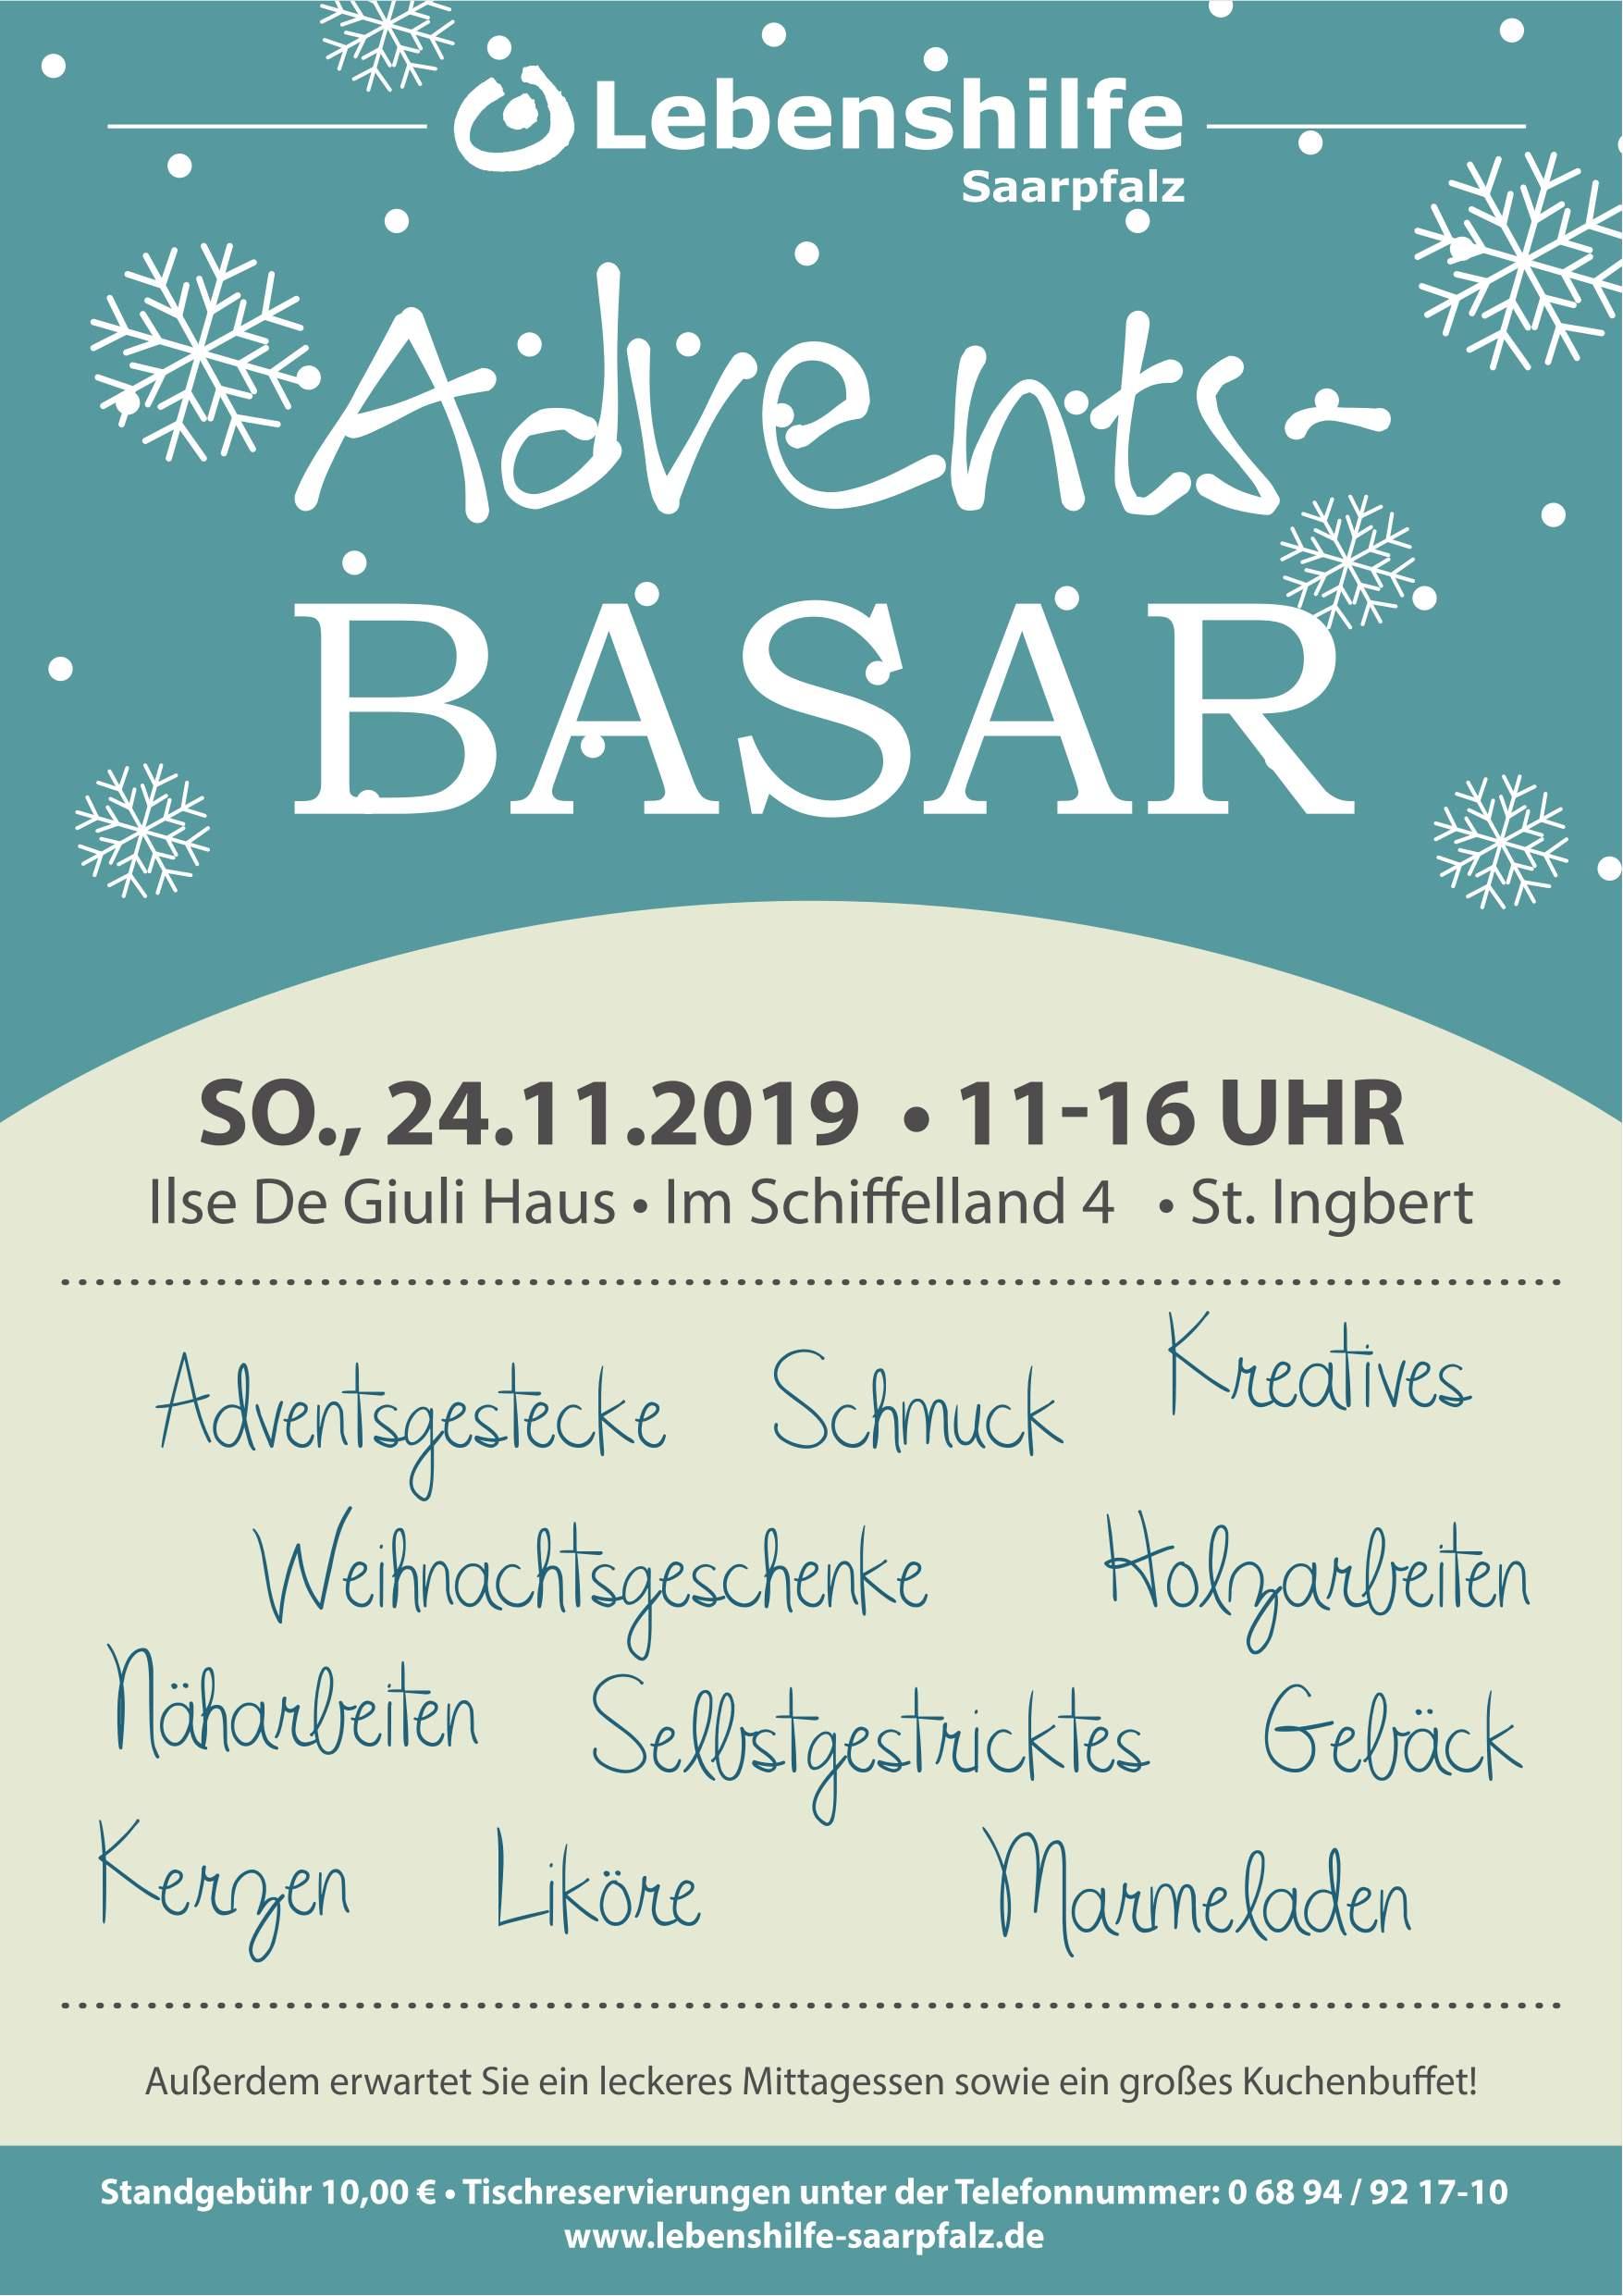 Adventsbasar der Lebenshilfe Saarpfalz